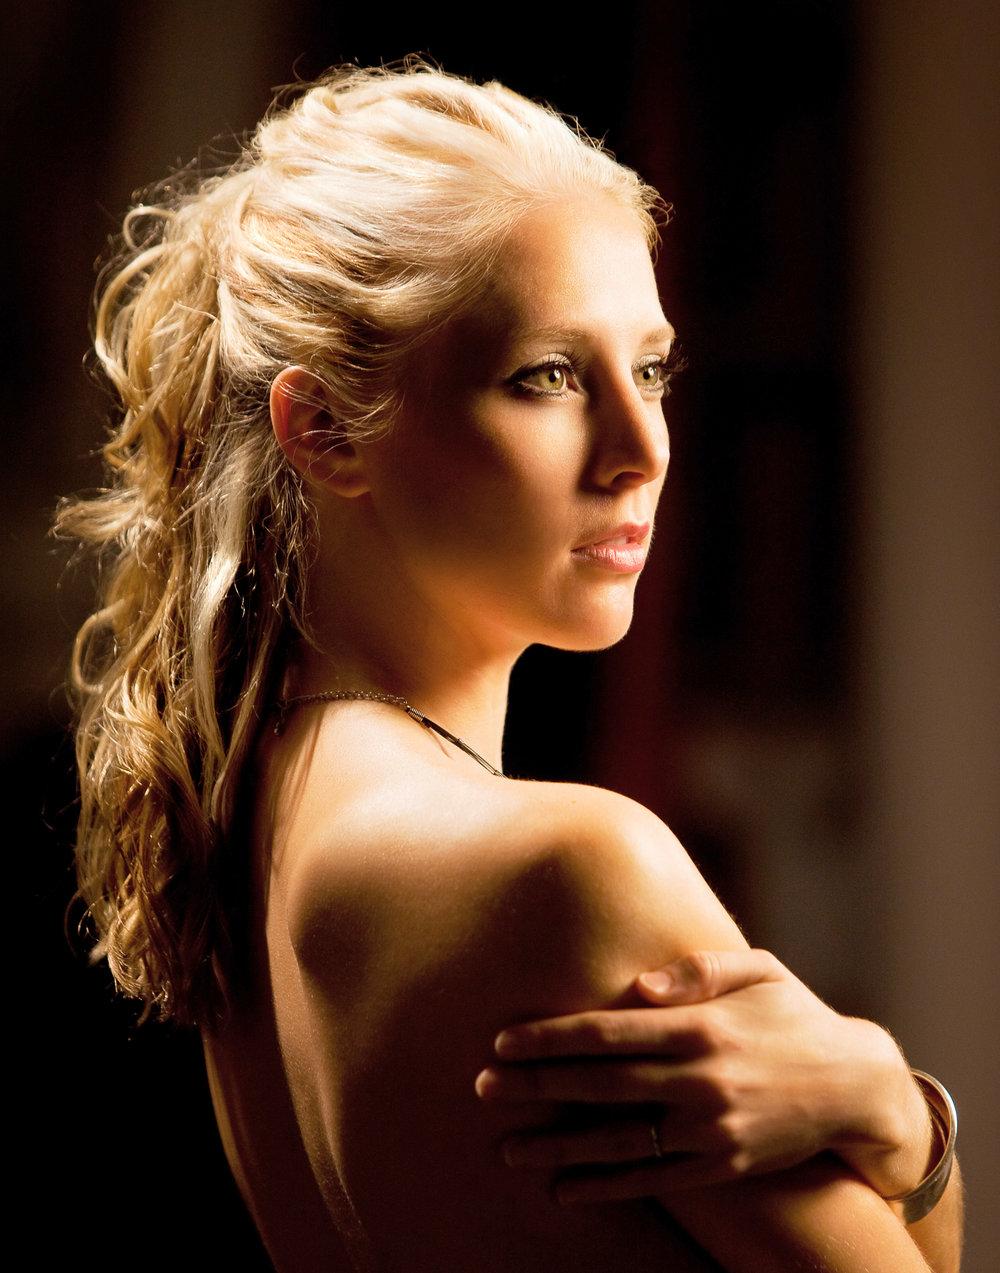 Portrait - Ballet Dancer Hannah Bontrager 3393.jpg